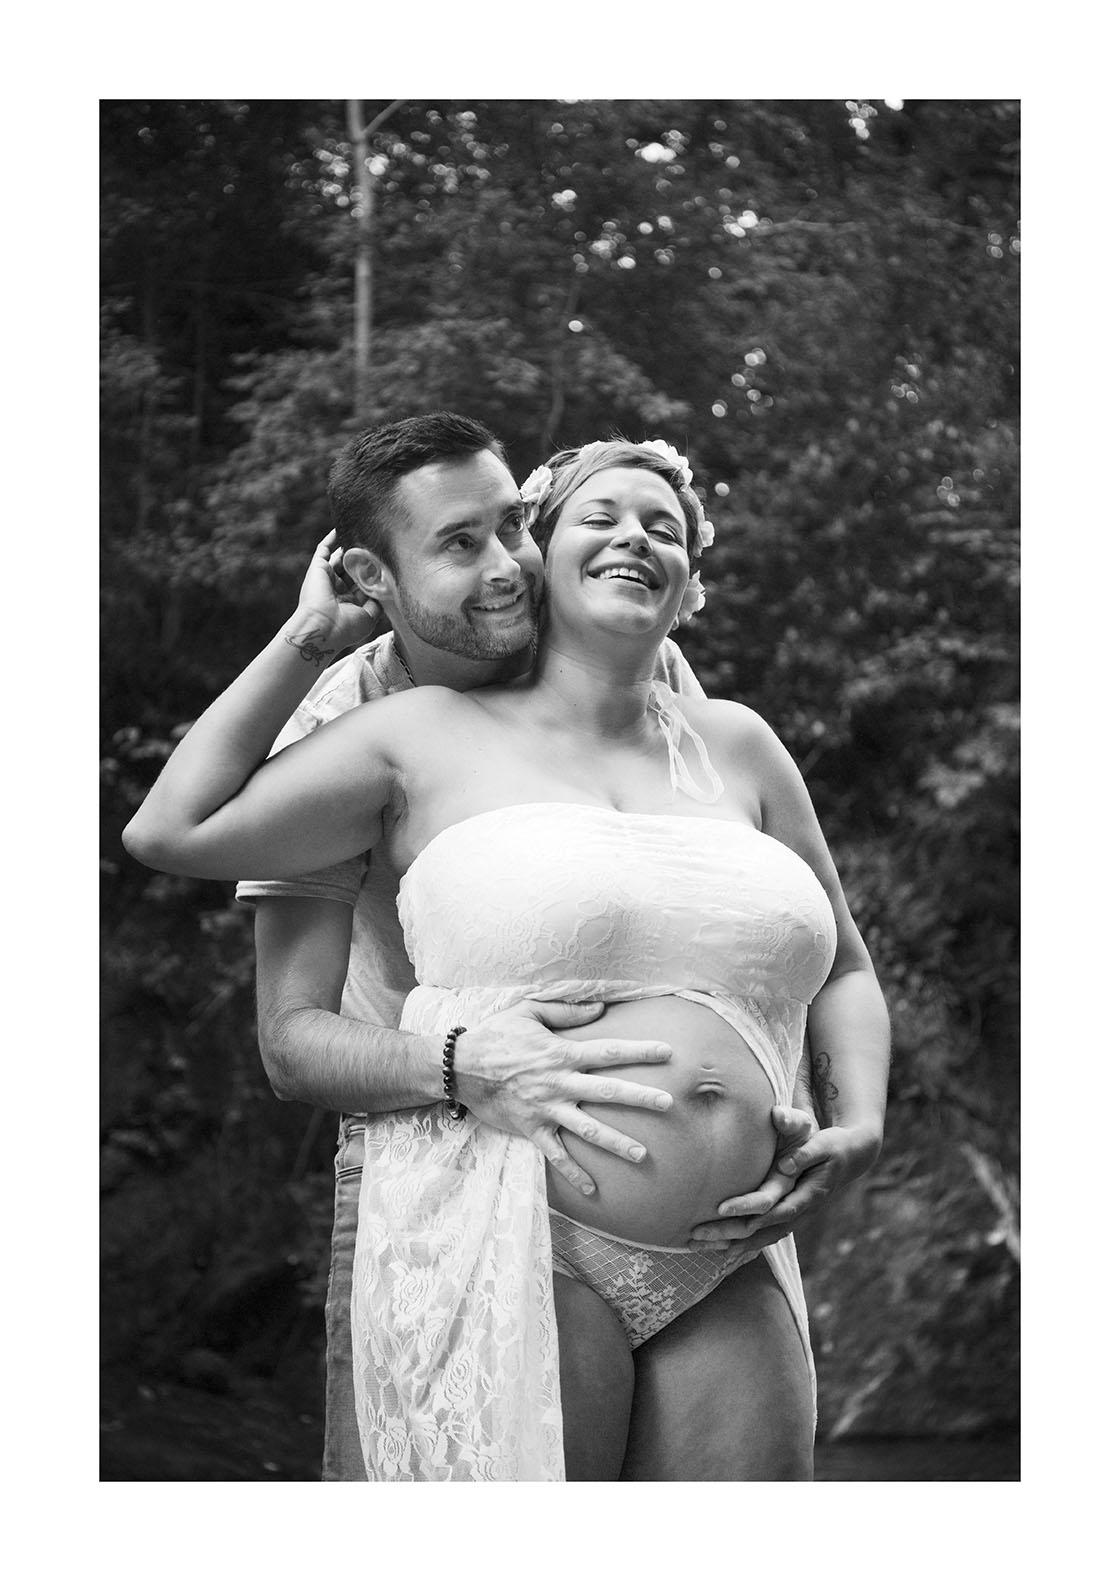 shooting Morgane Boëm evenements lyon maternité photographe